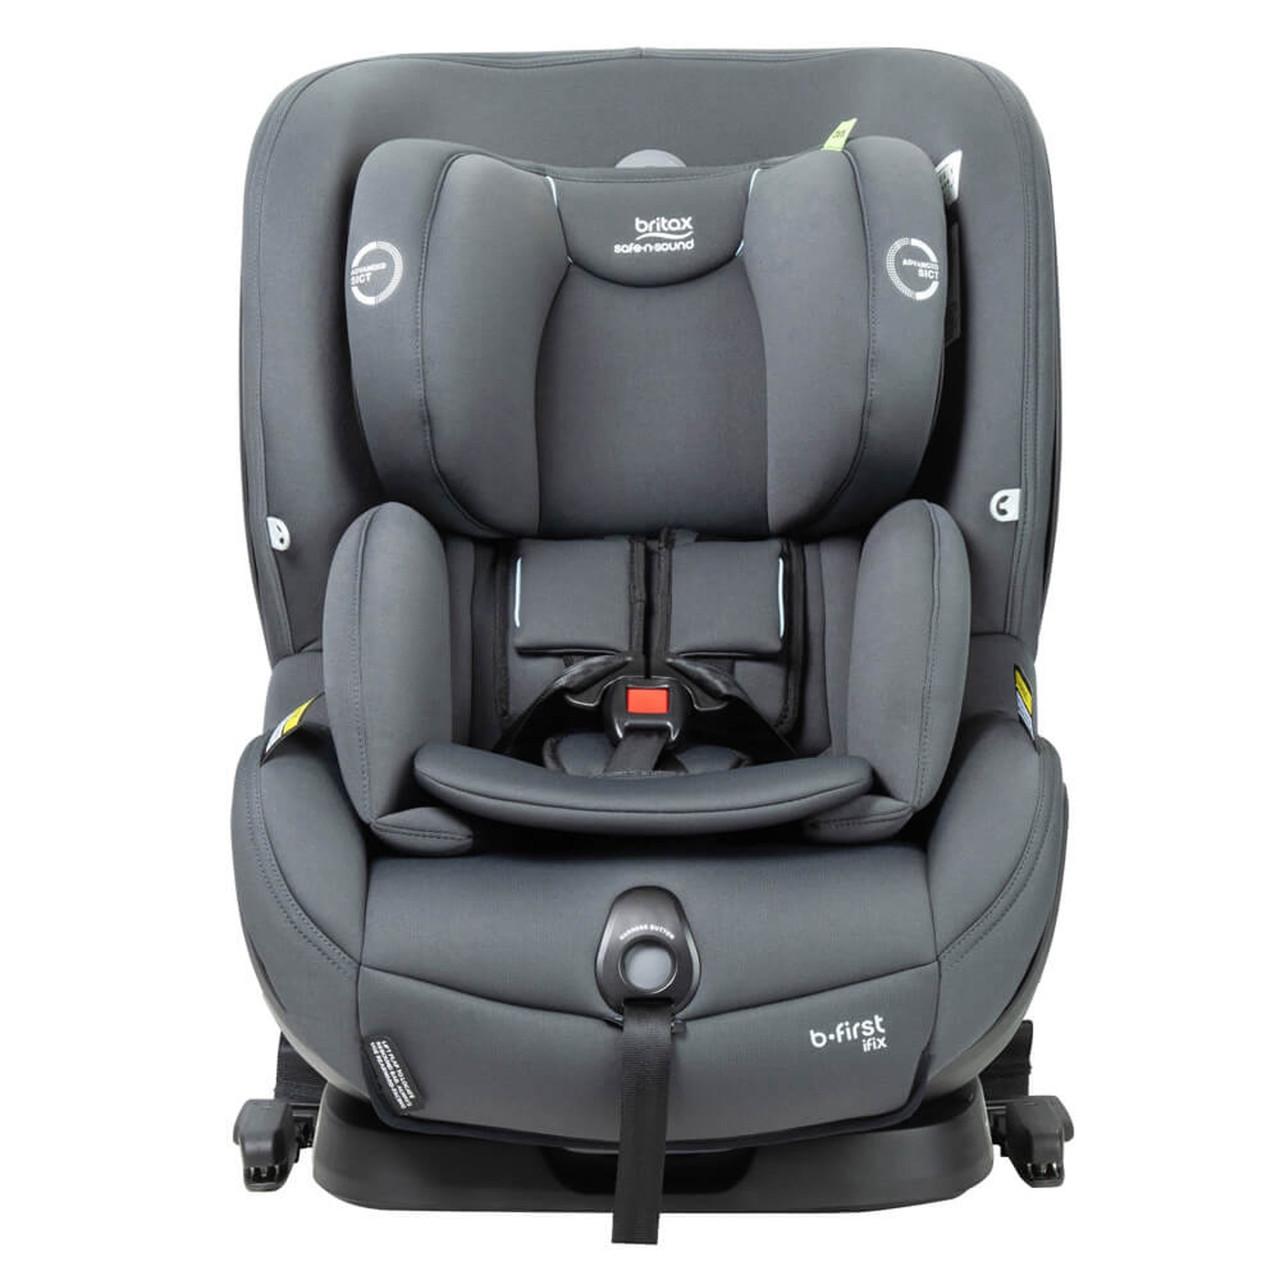 Britax Safe-n-Sound B-First ifix at Baby Barn Discounts Britax B First ifix convertible rearward facing baby seat.